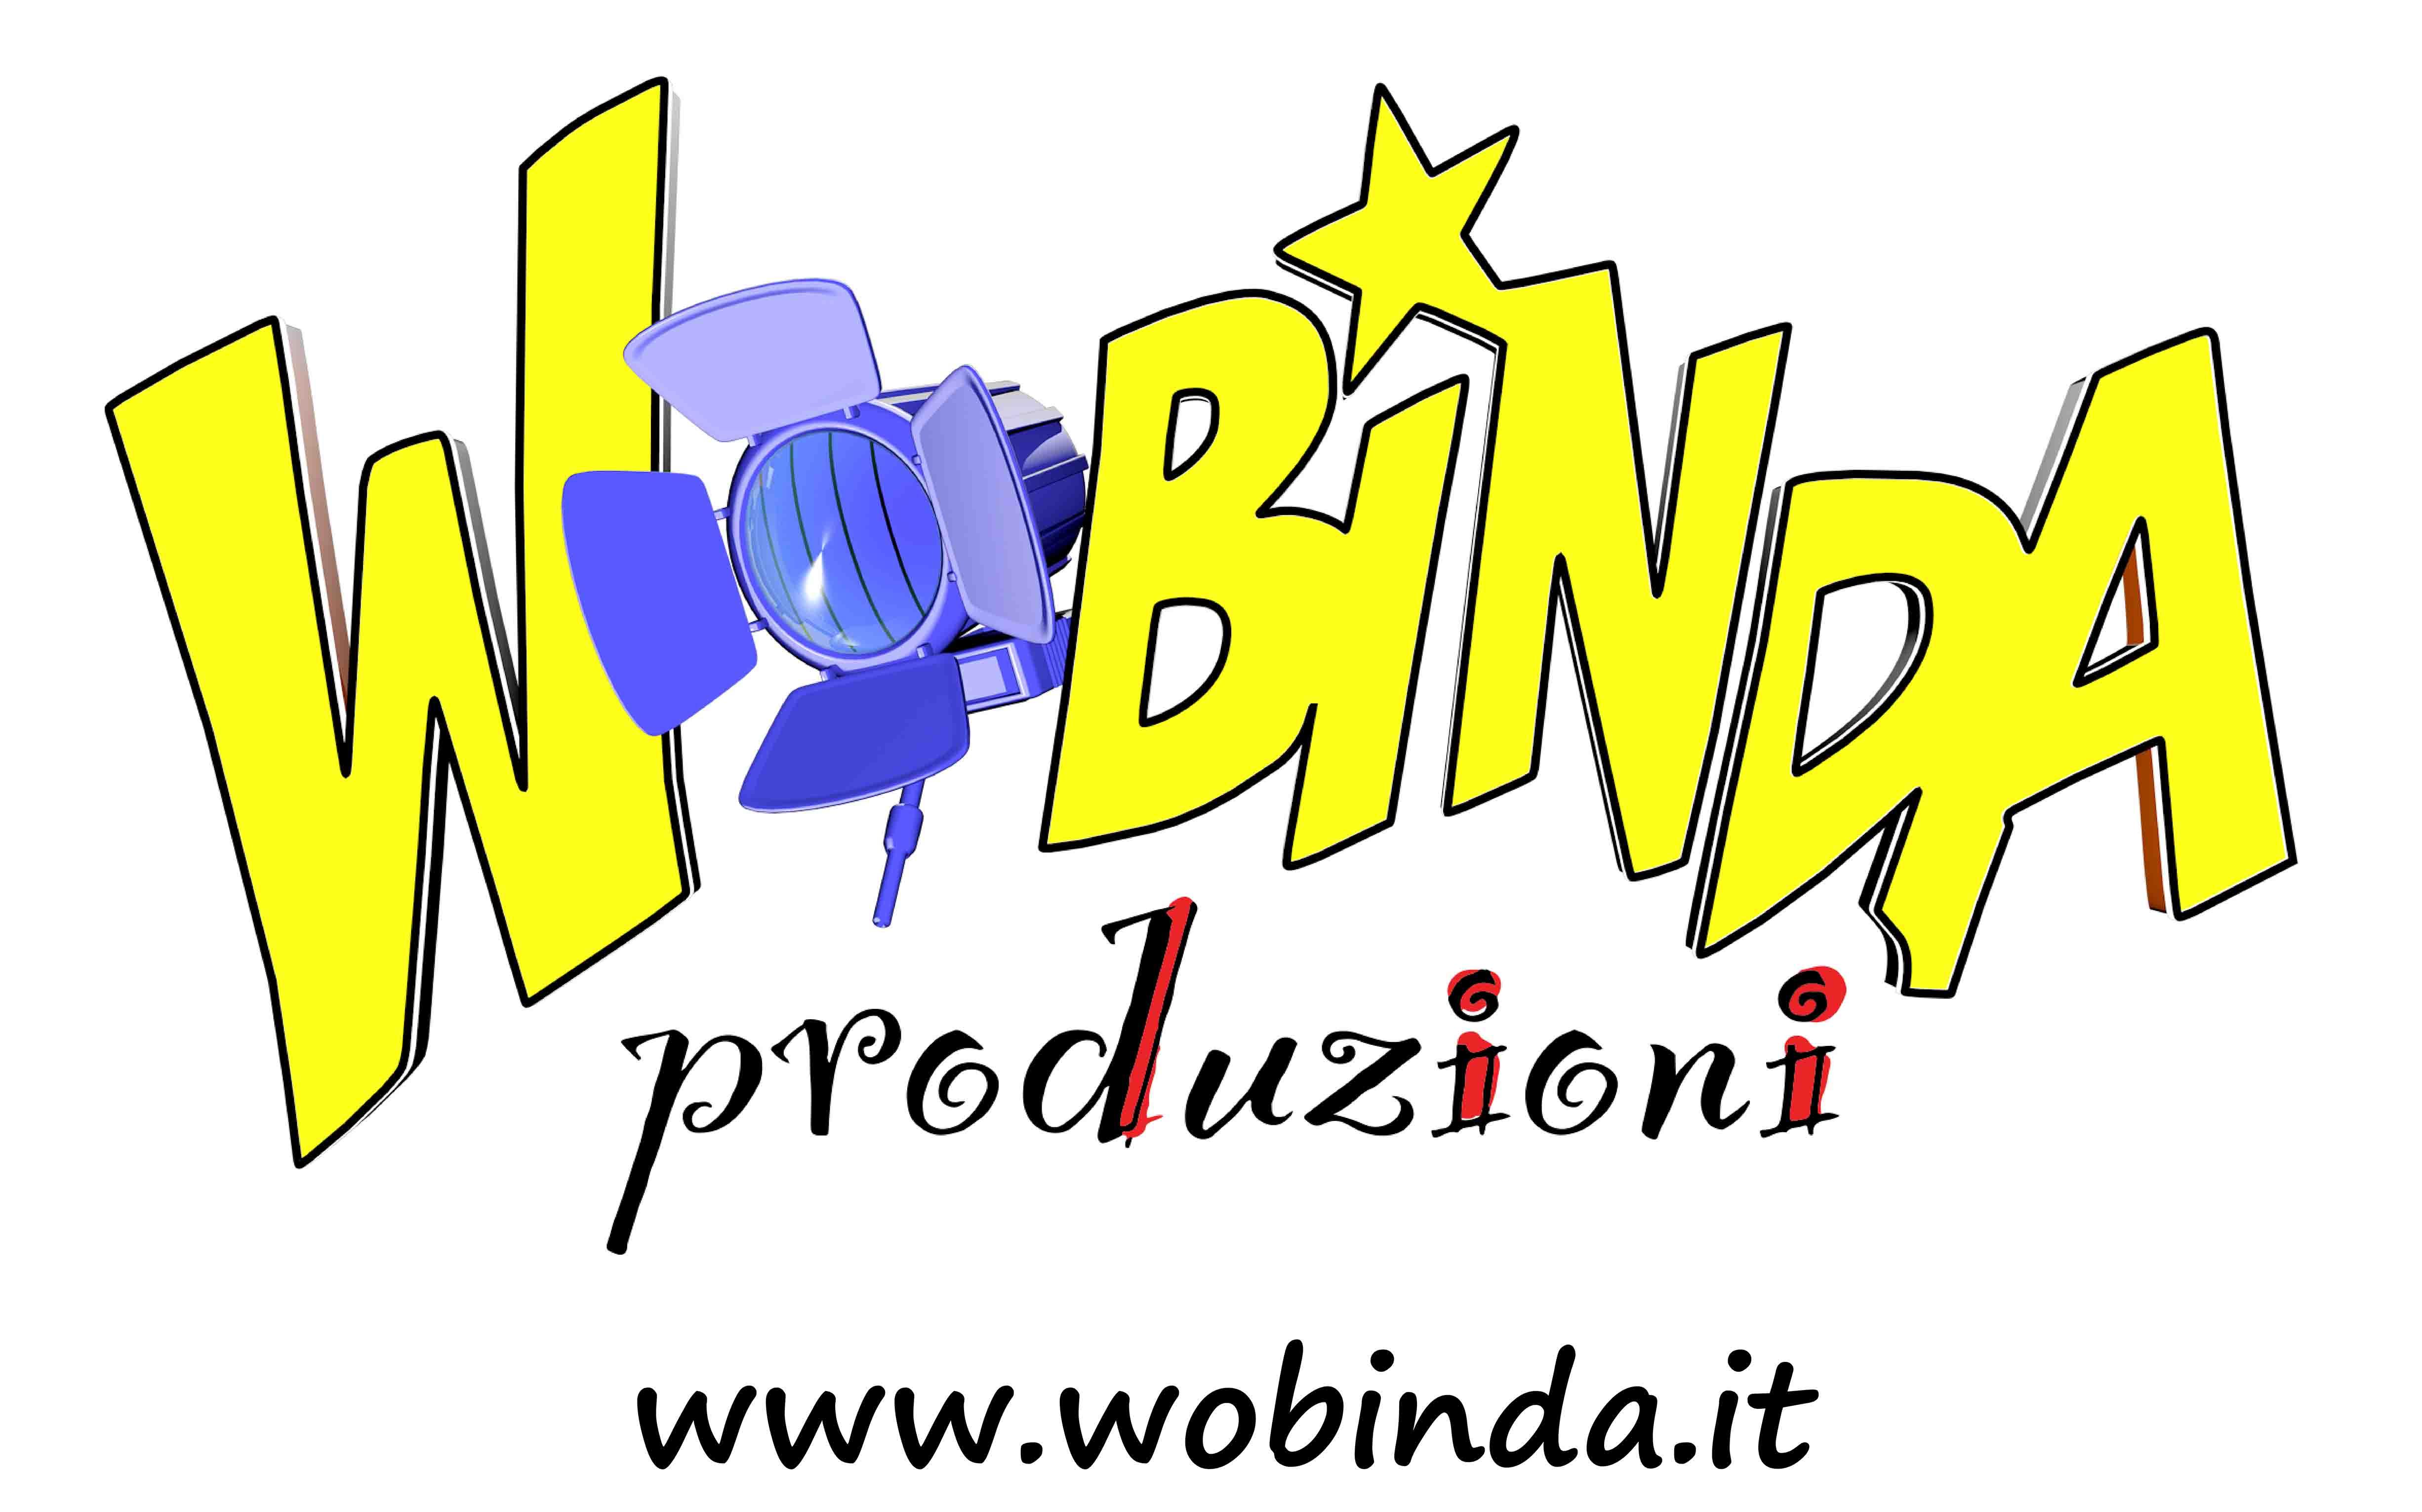 2018 Logo Wobinda - Casting Tour